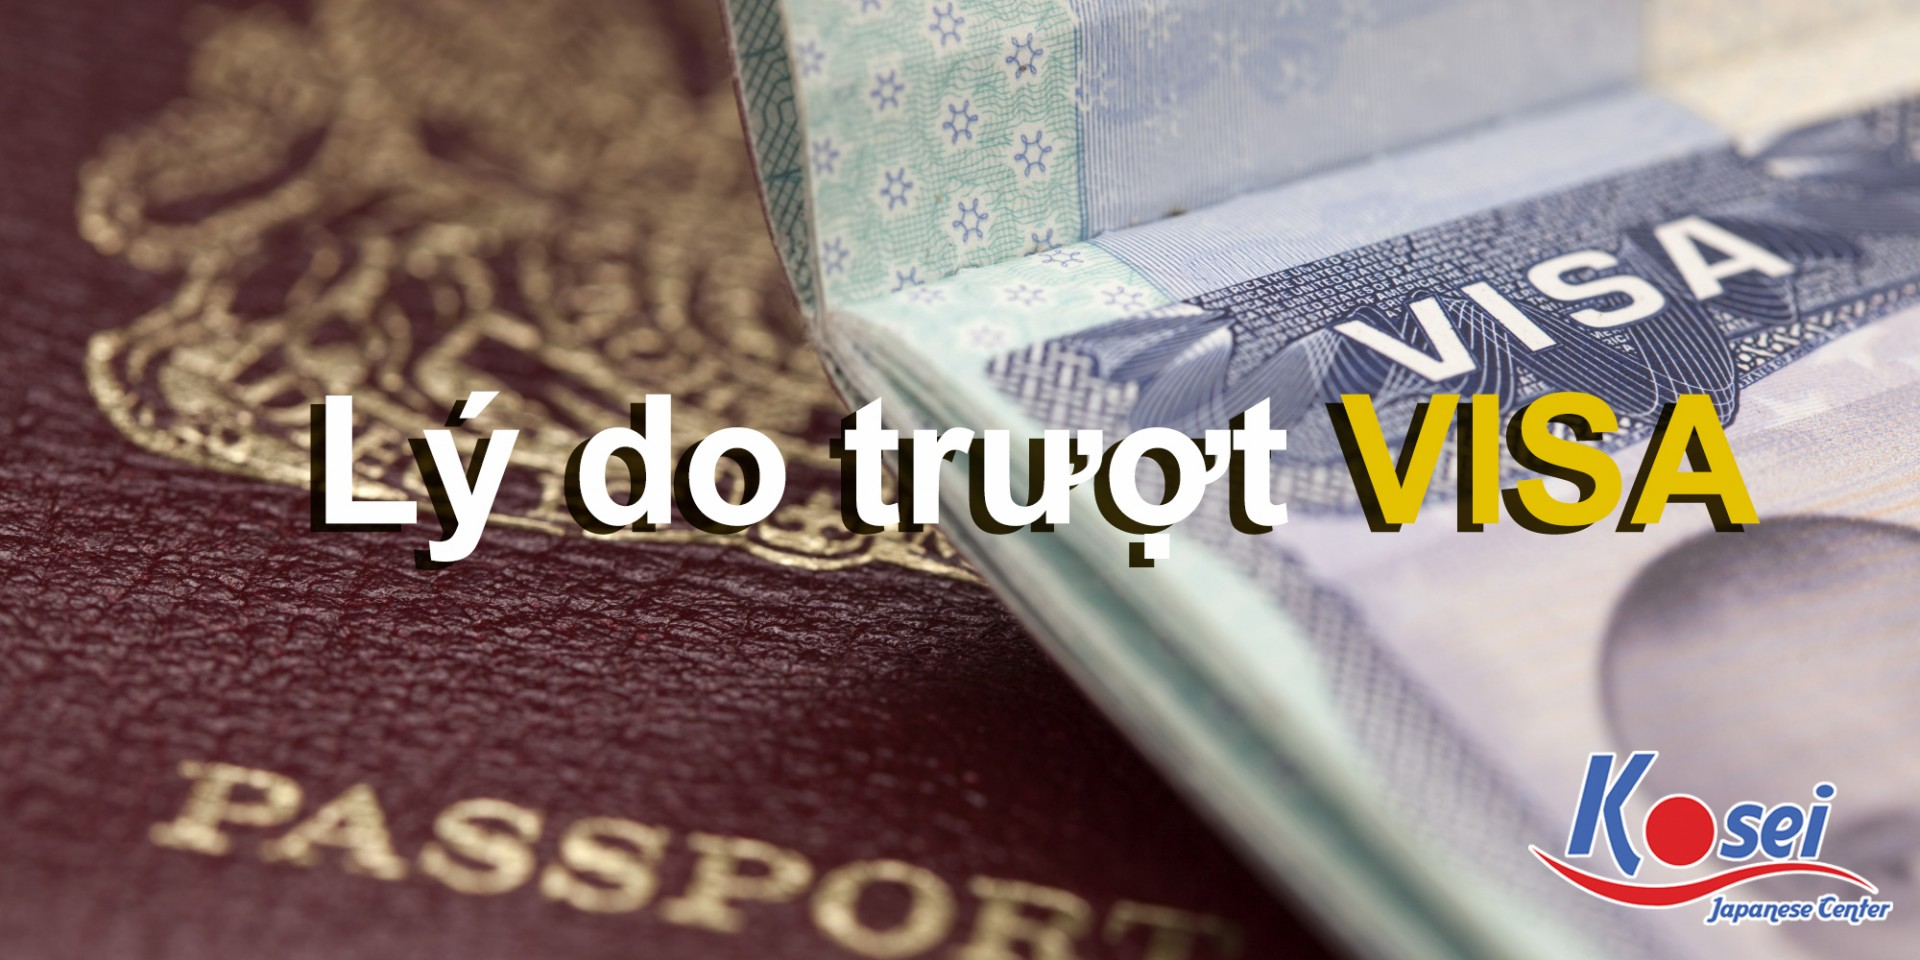 http://kosei.vn/giai-ma-ly-do-truot-visa-n1416.html